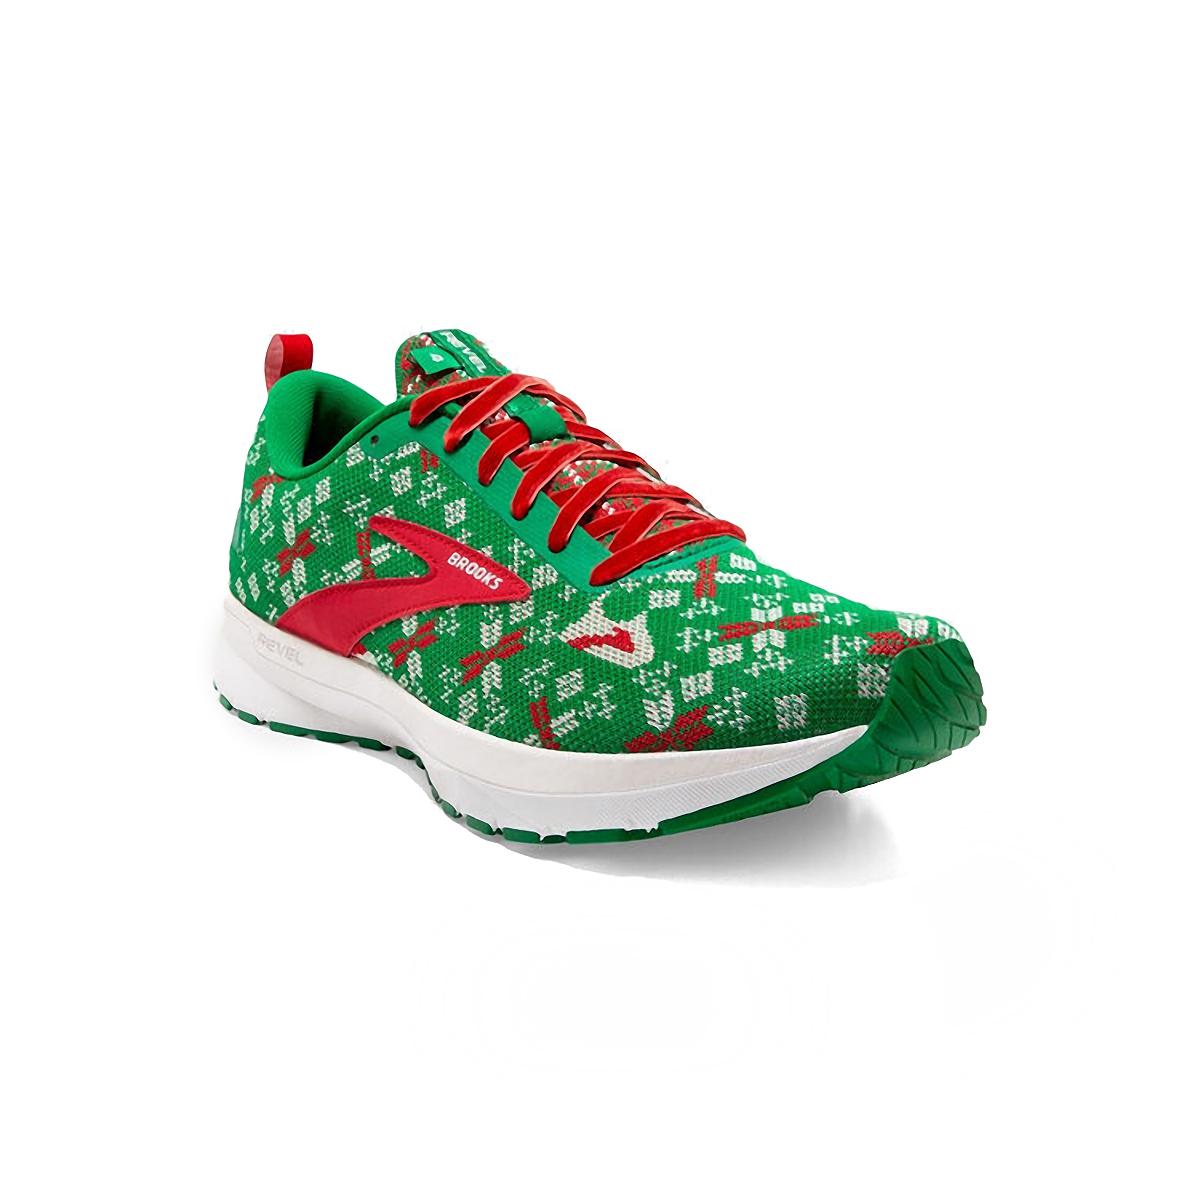 Men's Brooks Run Merry Revel 4 Running Shoe - Color: Jolly Green/Red/White - Size: 7 - Width: Regular, Jolly Green/Red/White, large, image 3